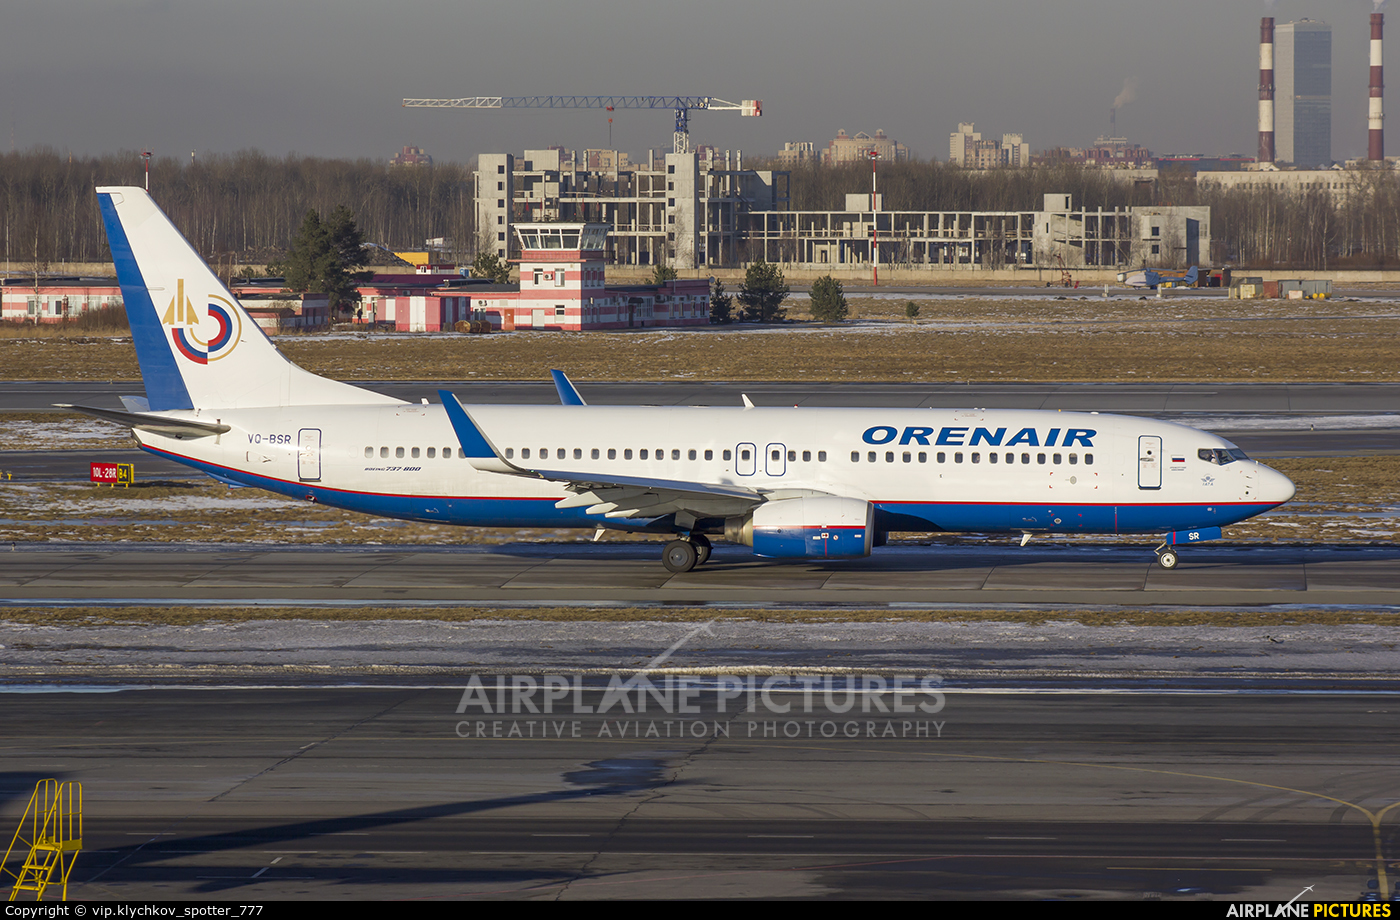 VQ-BSR - Orenair Boeing 737-800 at St  Petersburg - Pulkovo